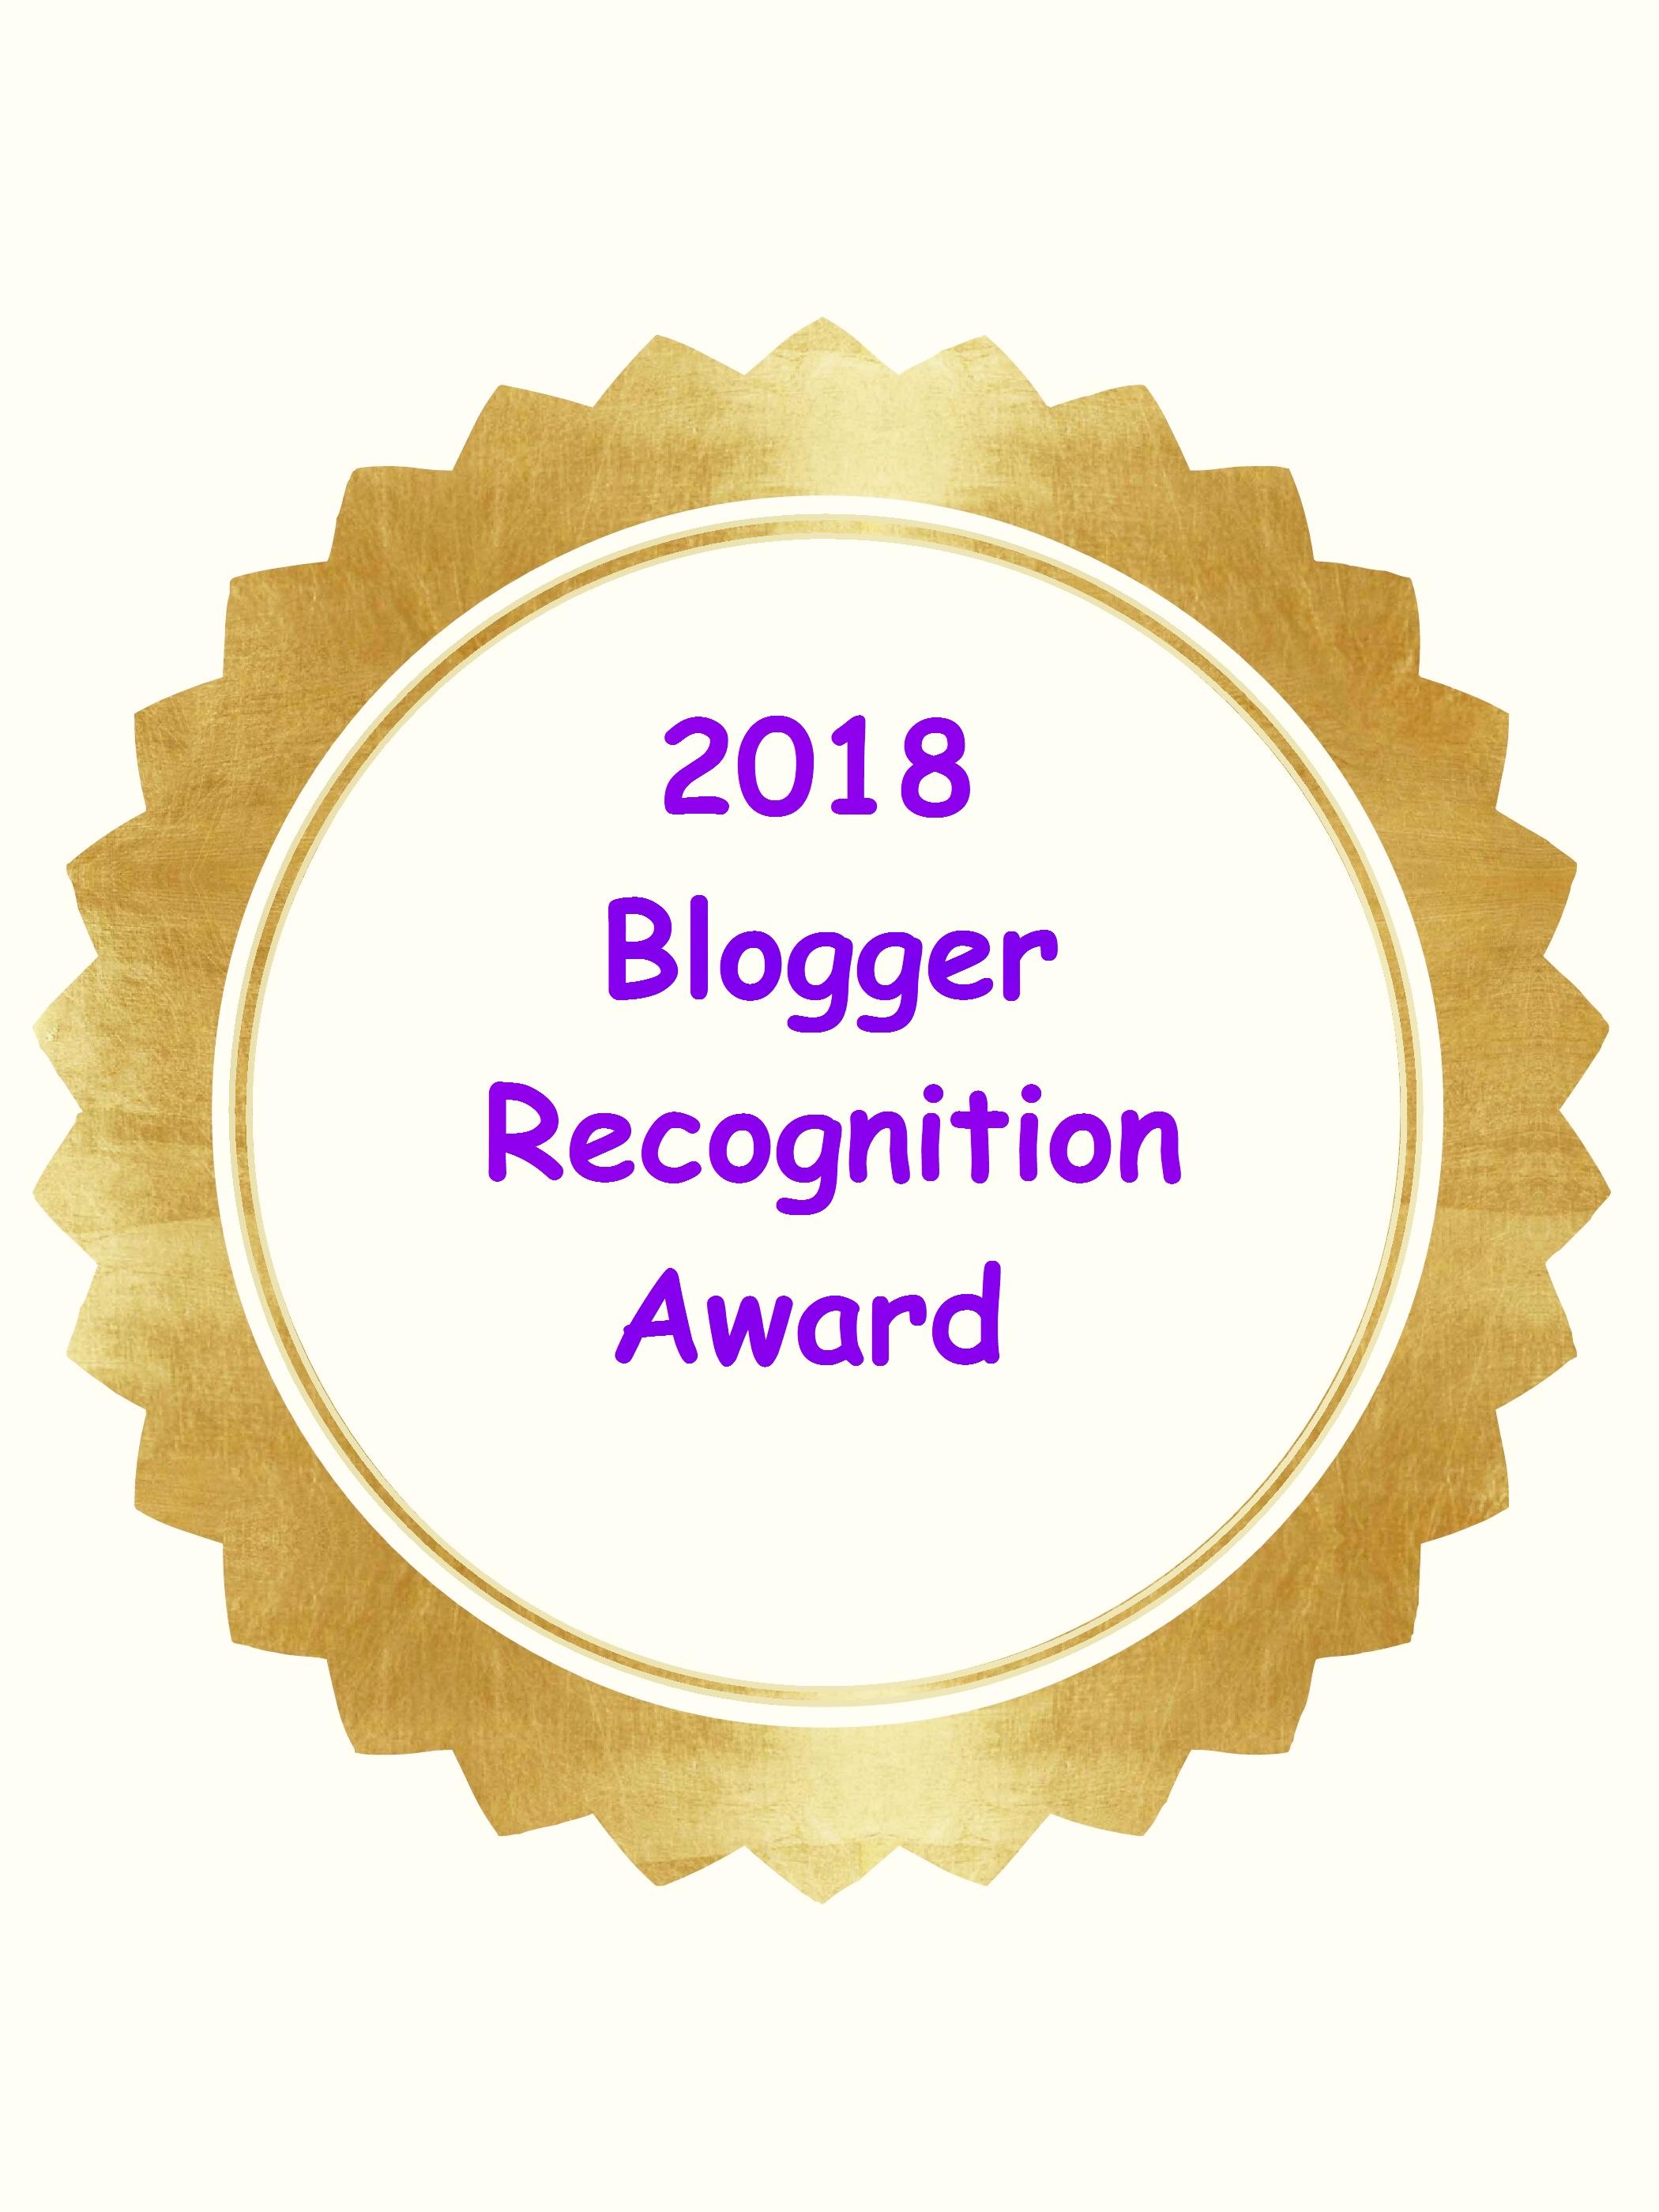 2018 Blogger Recognition Award Medallion